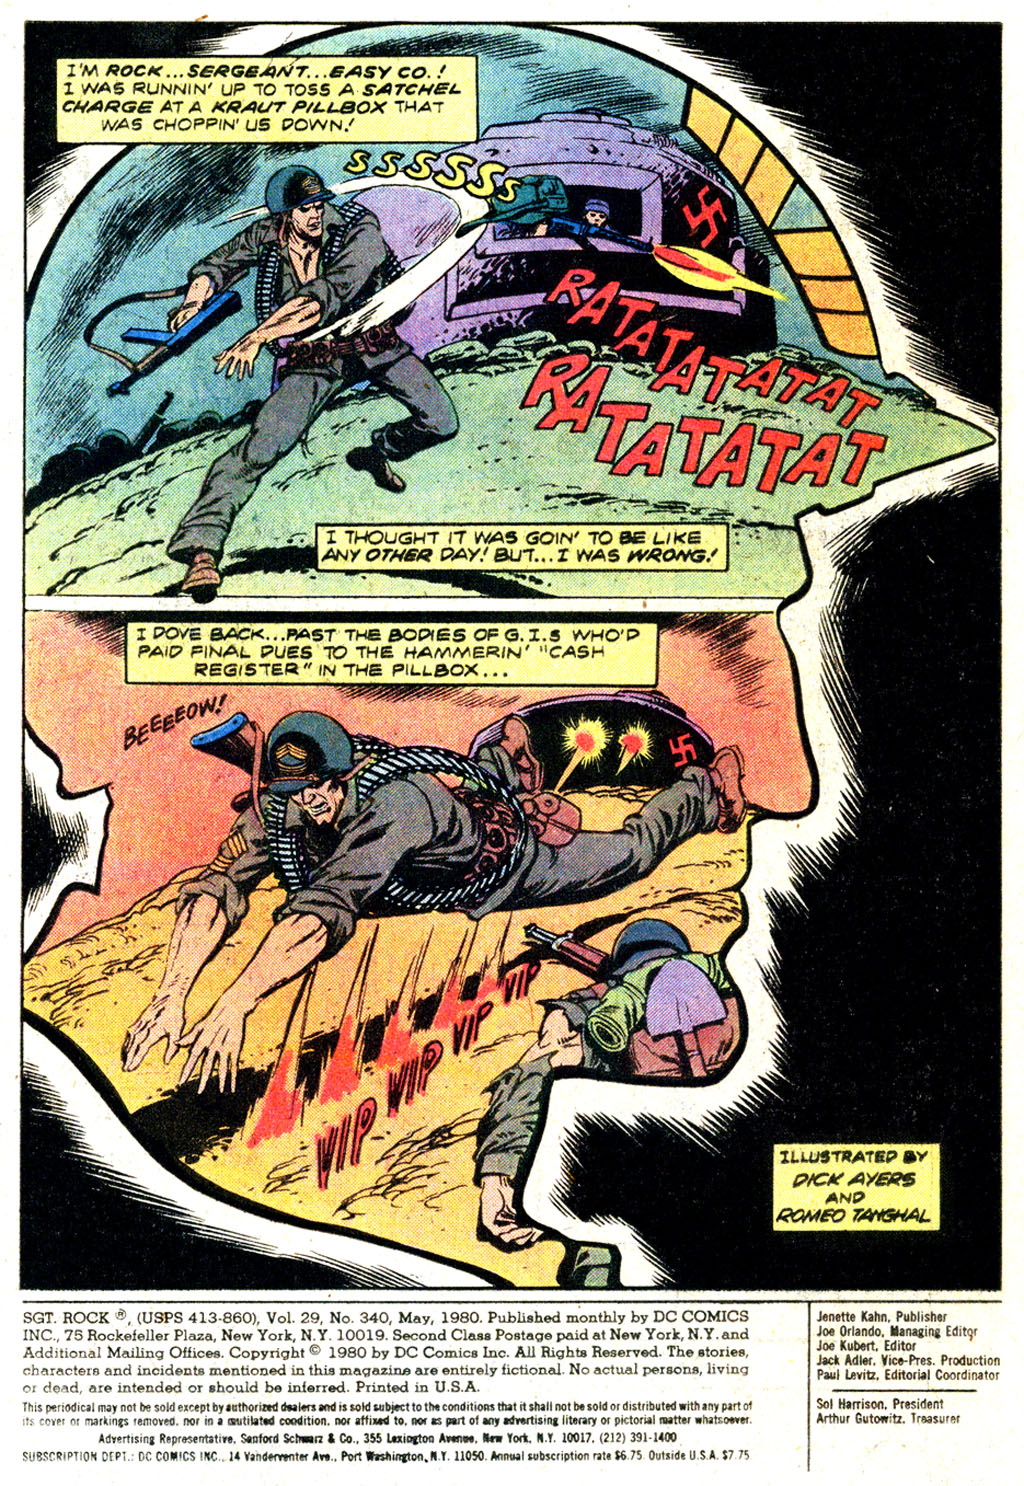 Read online Sgt. Rock comic -  Issue #340 - 2